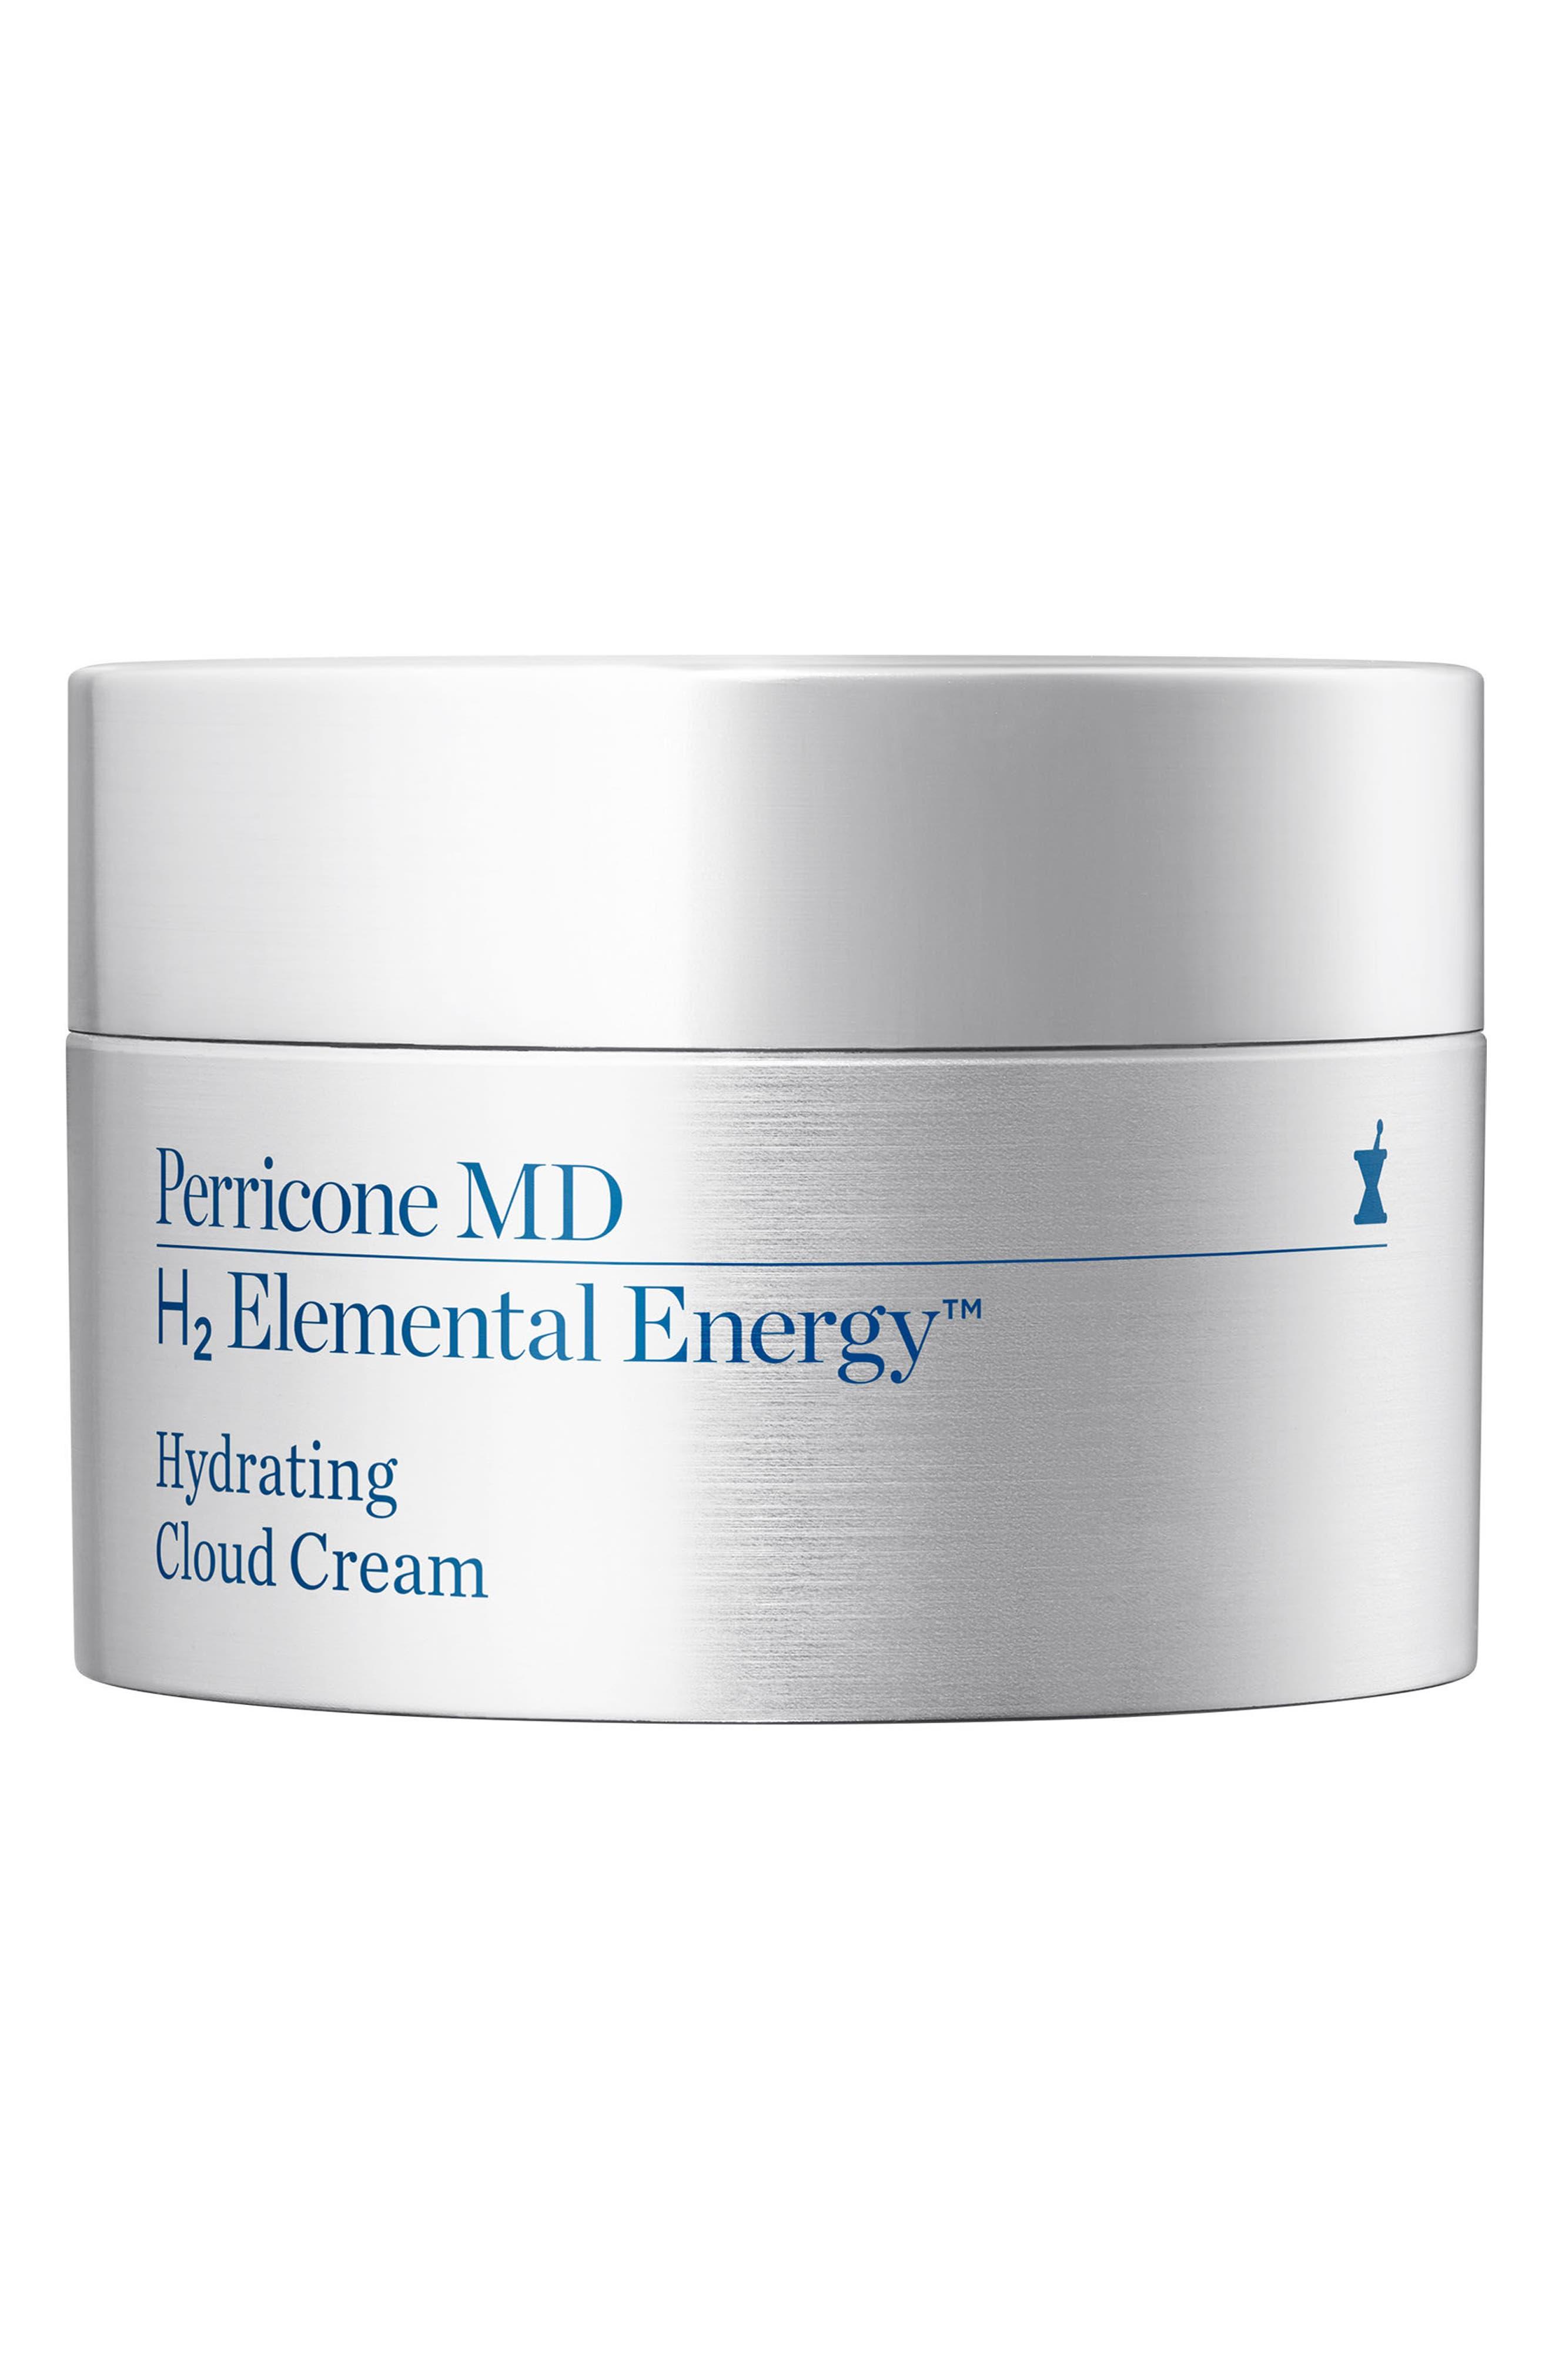 Perricone MD H2 Elemental Energy Hydrating Cloud Cream